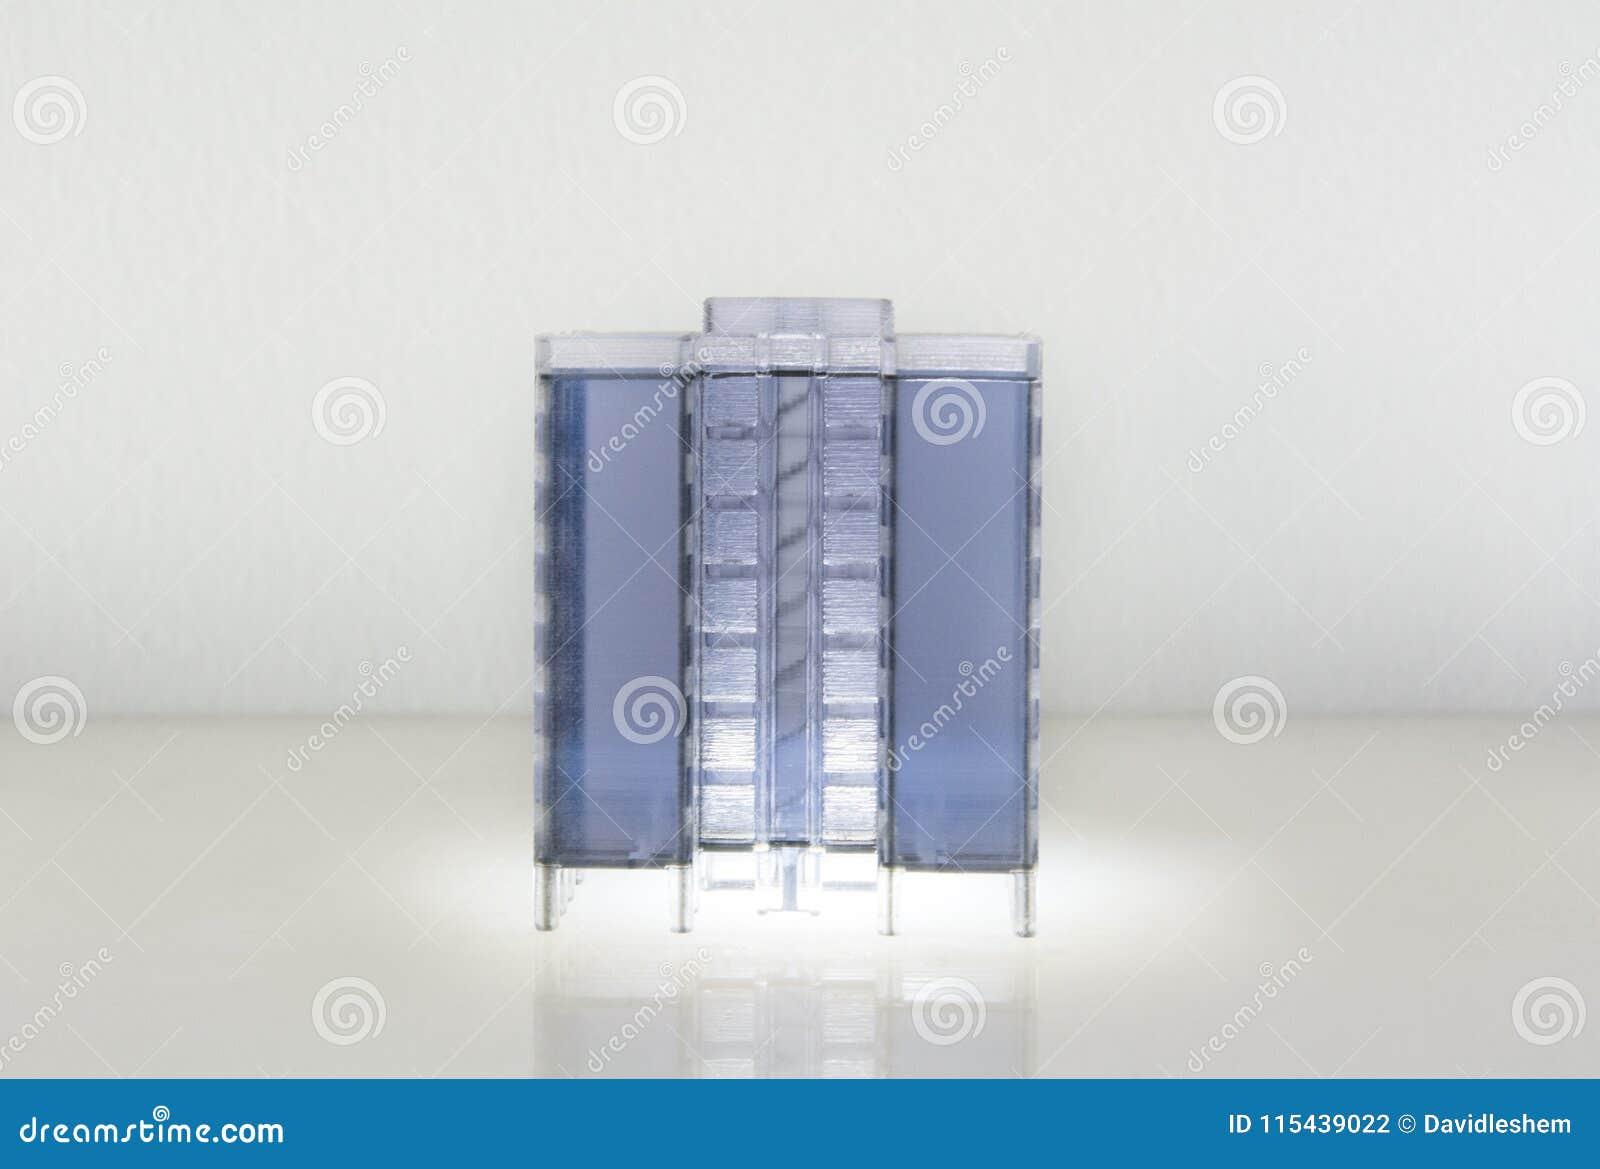 Architecture miniature models